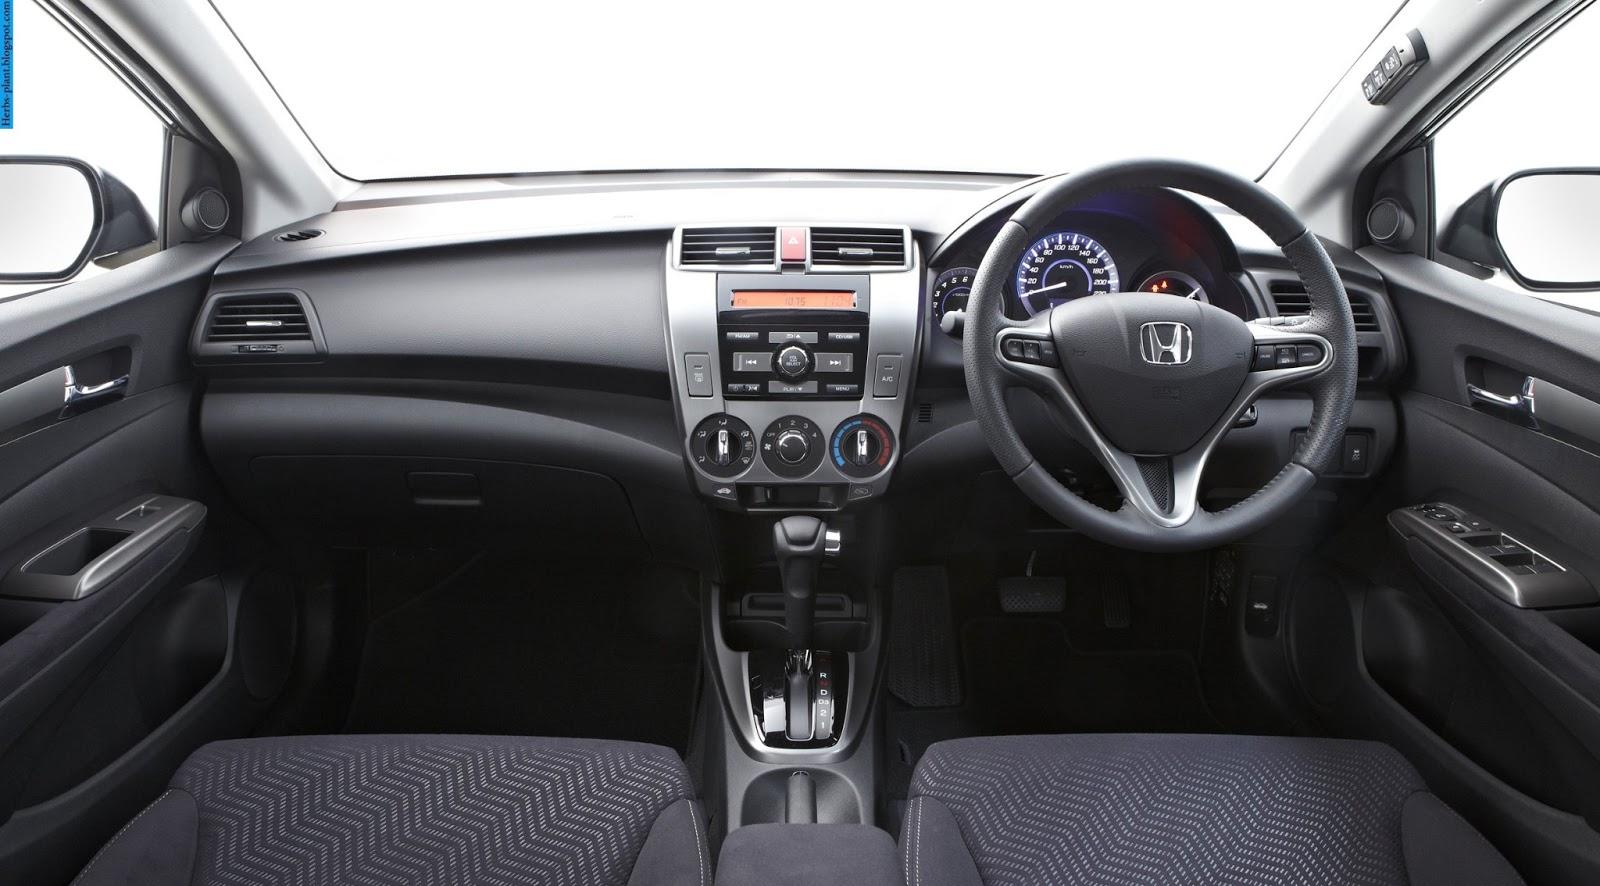 Honda city car 2012 dashboard - صور تابلوه سيارة هوندا سيتي 2012